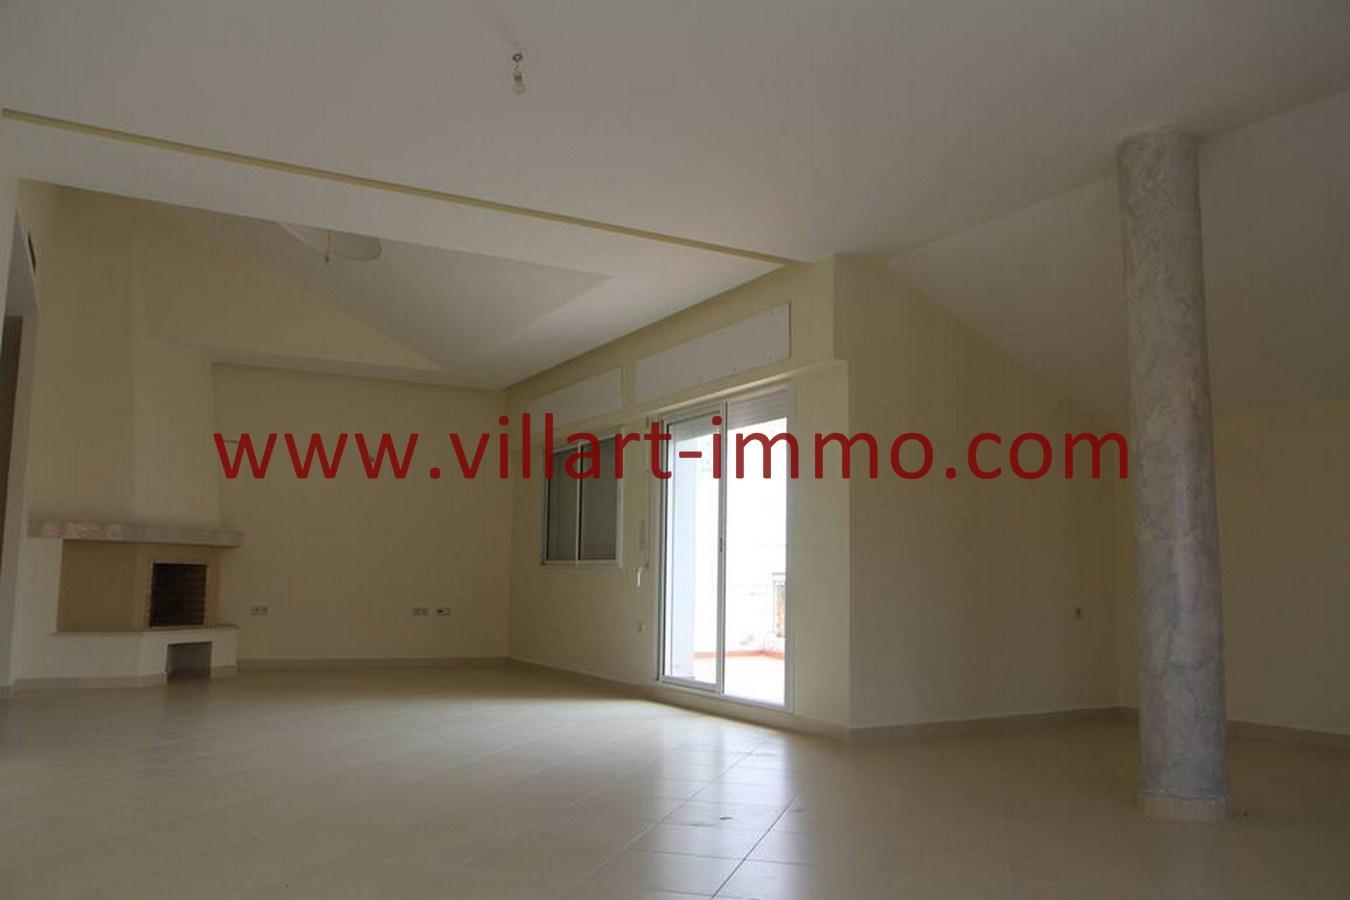 3-Vente-Projet Raiso-Tanger-Autres -Salon 1-Villart Immo